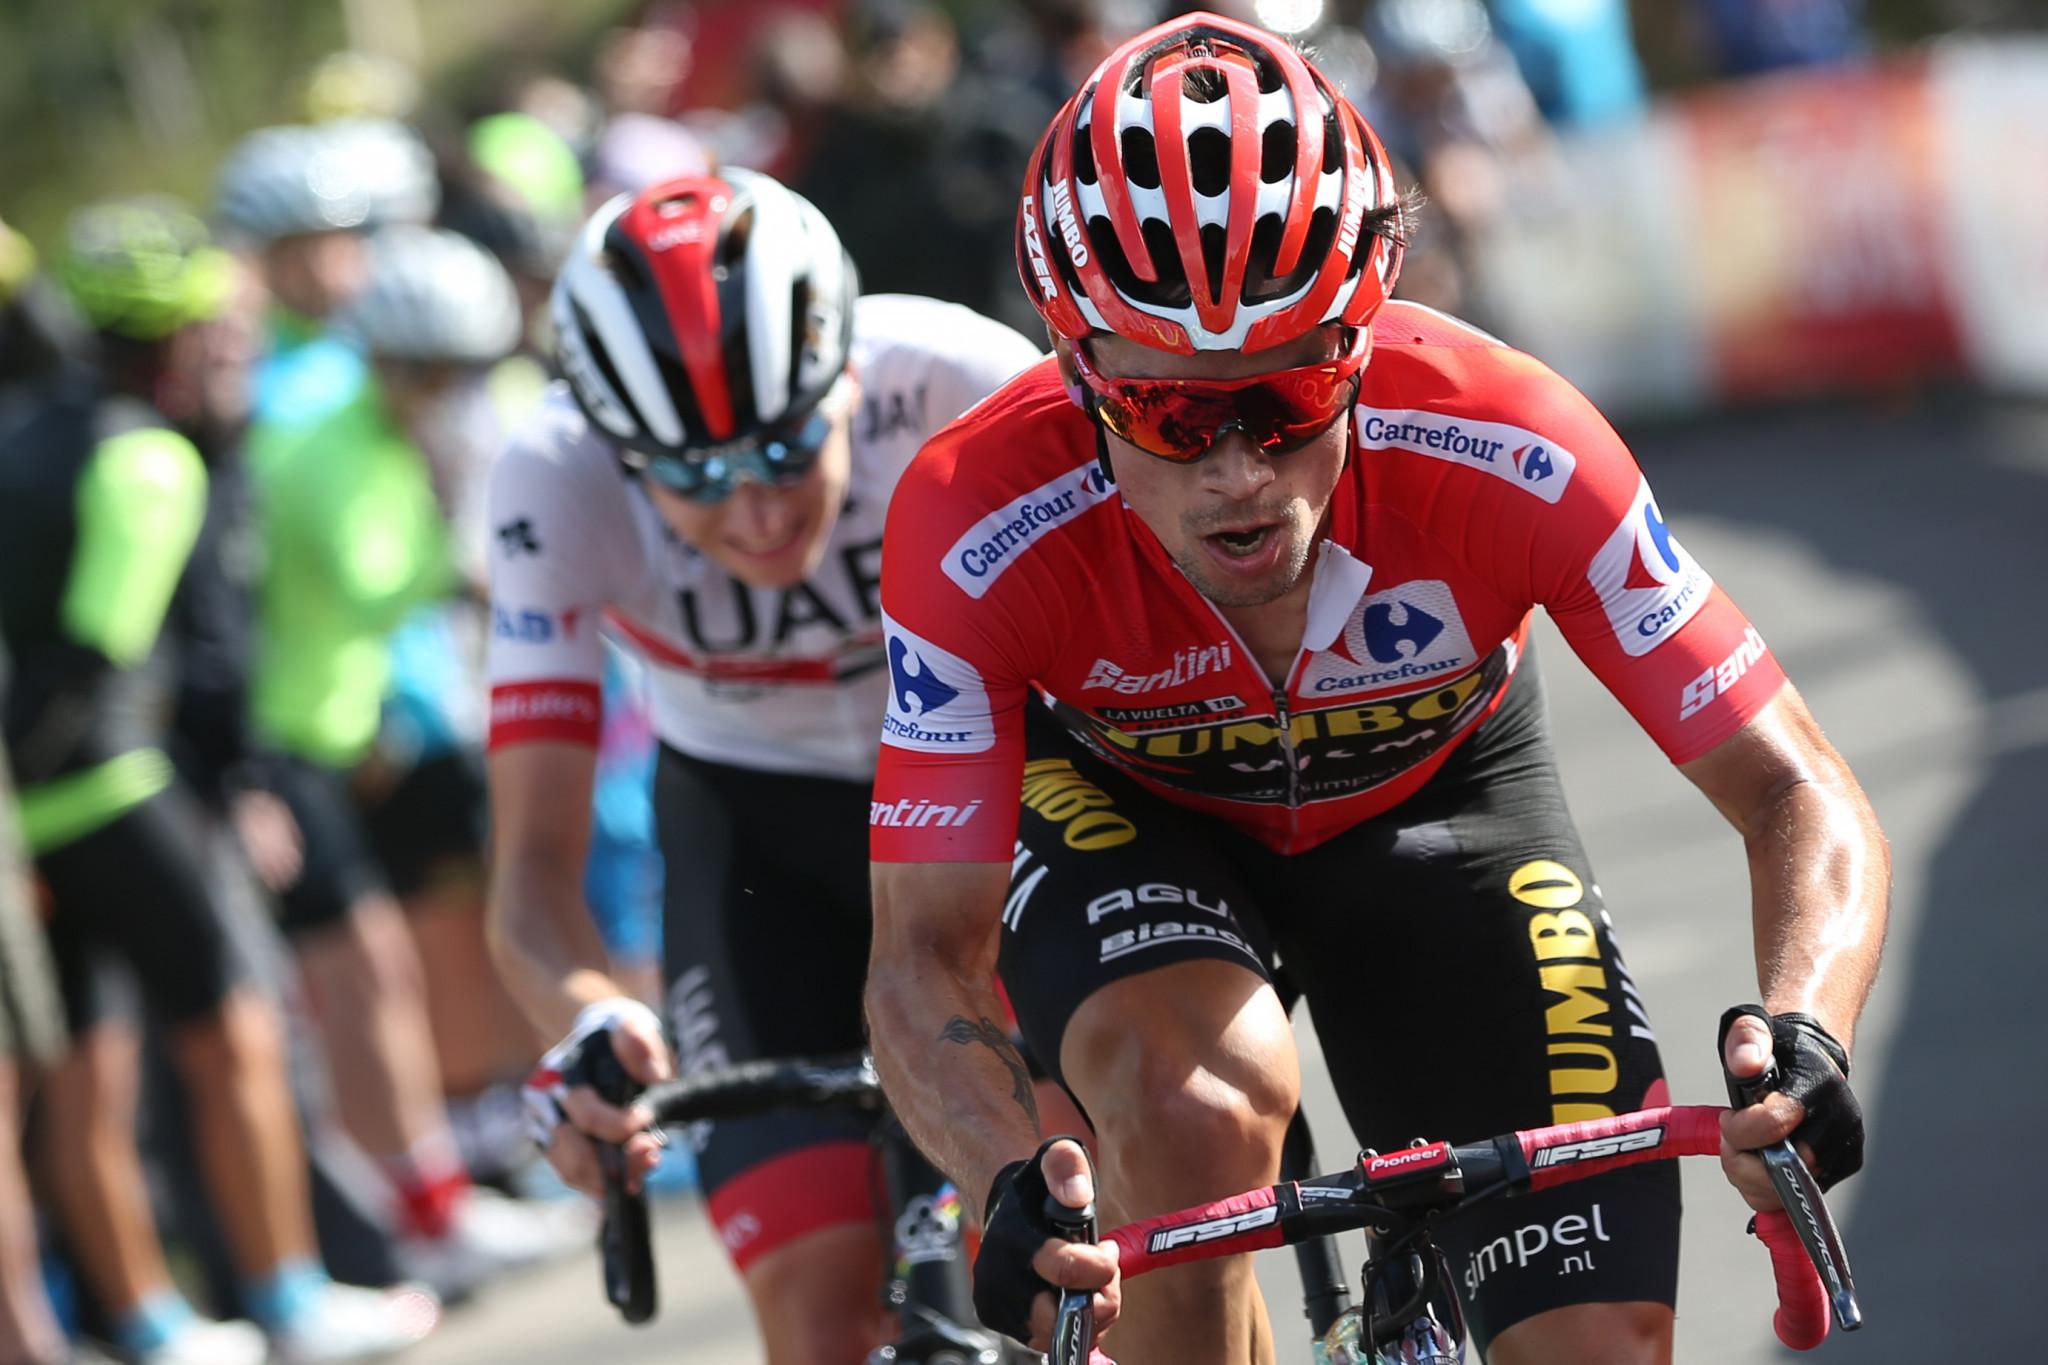 Roglič tightens grip on Vuelta a España by extending overall lead